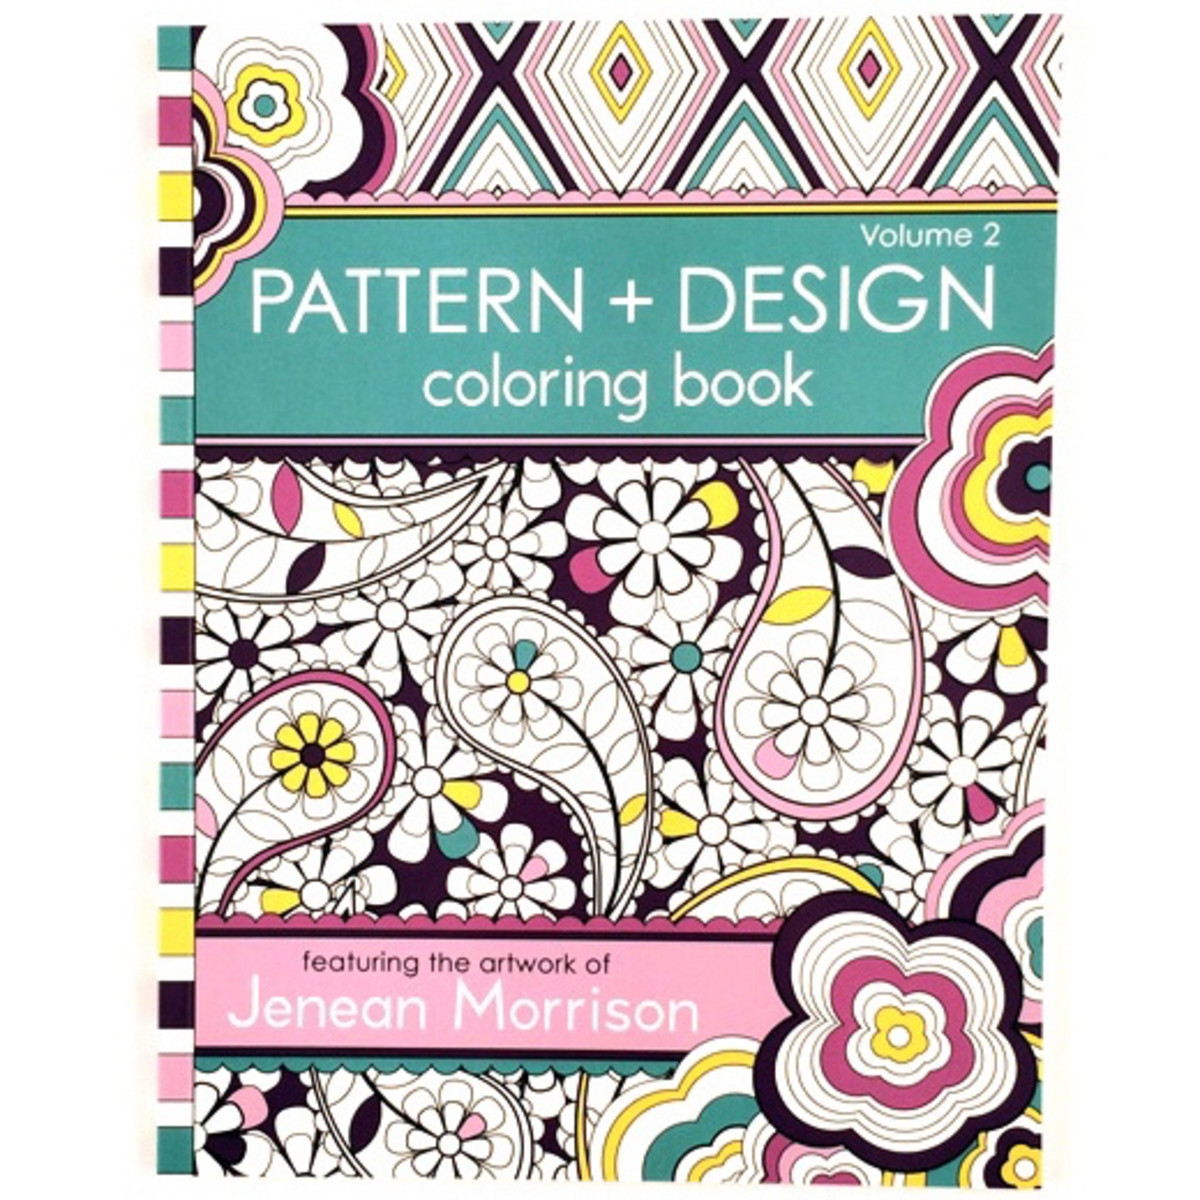 Pattern Design Jenean Morrison Coloring Book